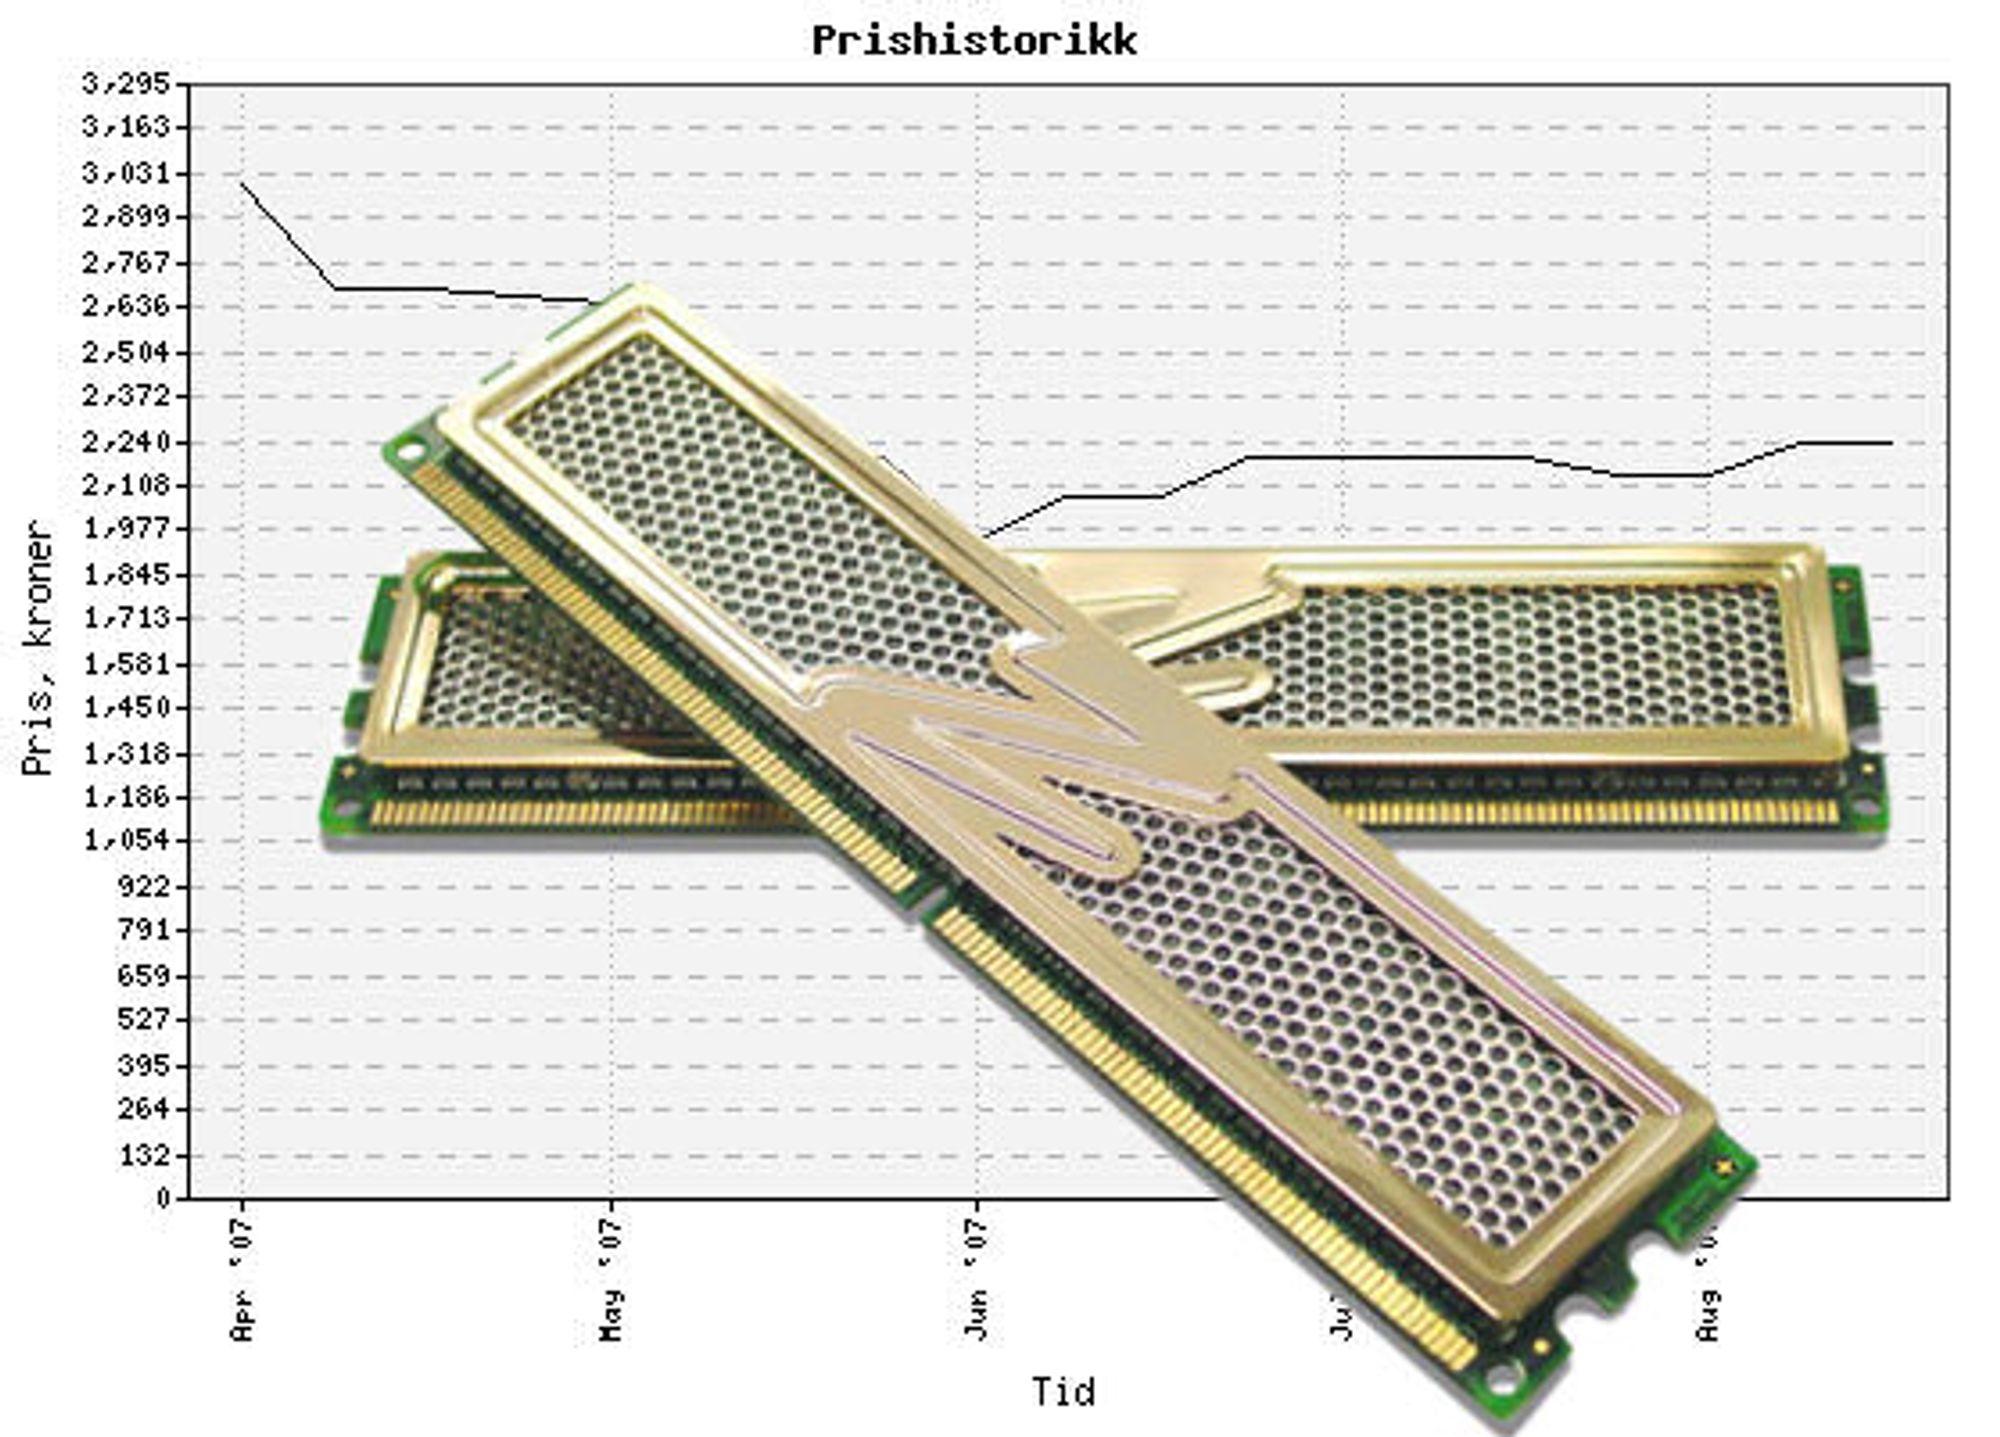 Mest populær i prisguiden: OCZ Gold XTC 4 GB DDR2-800